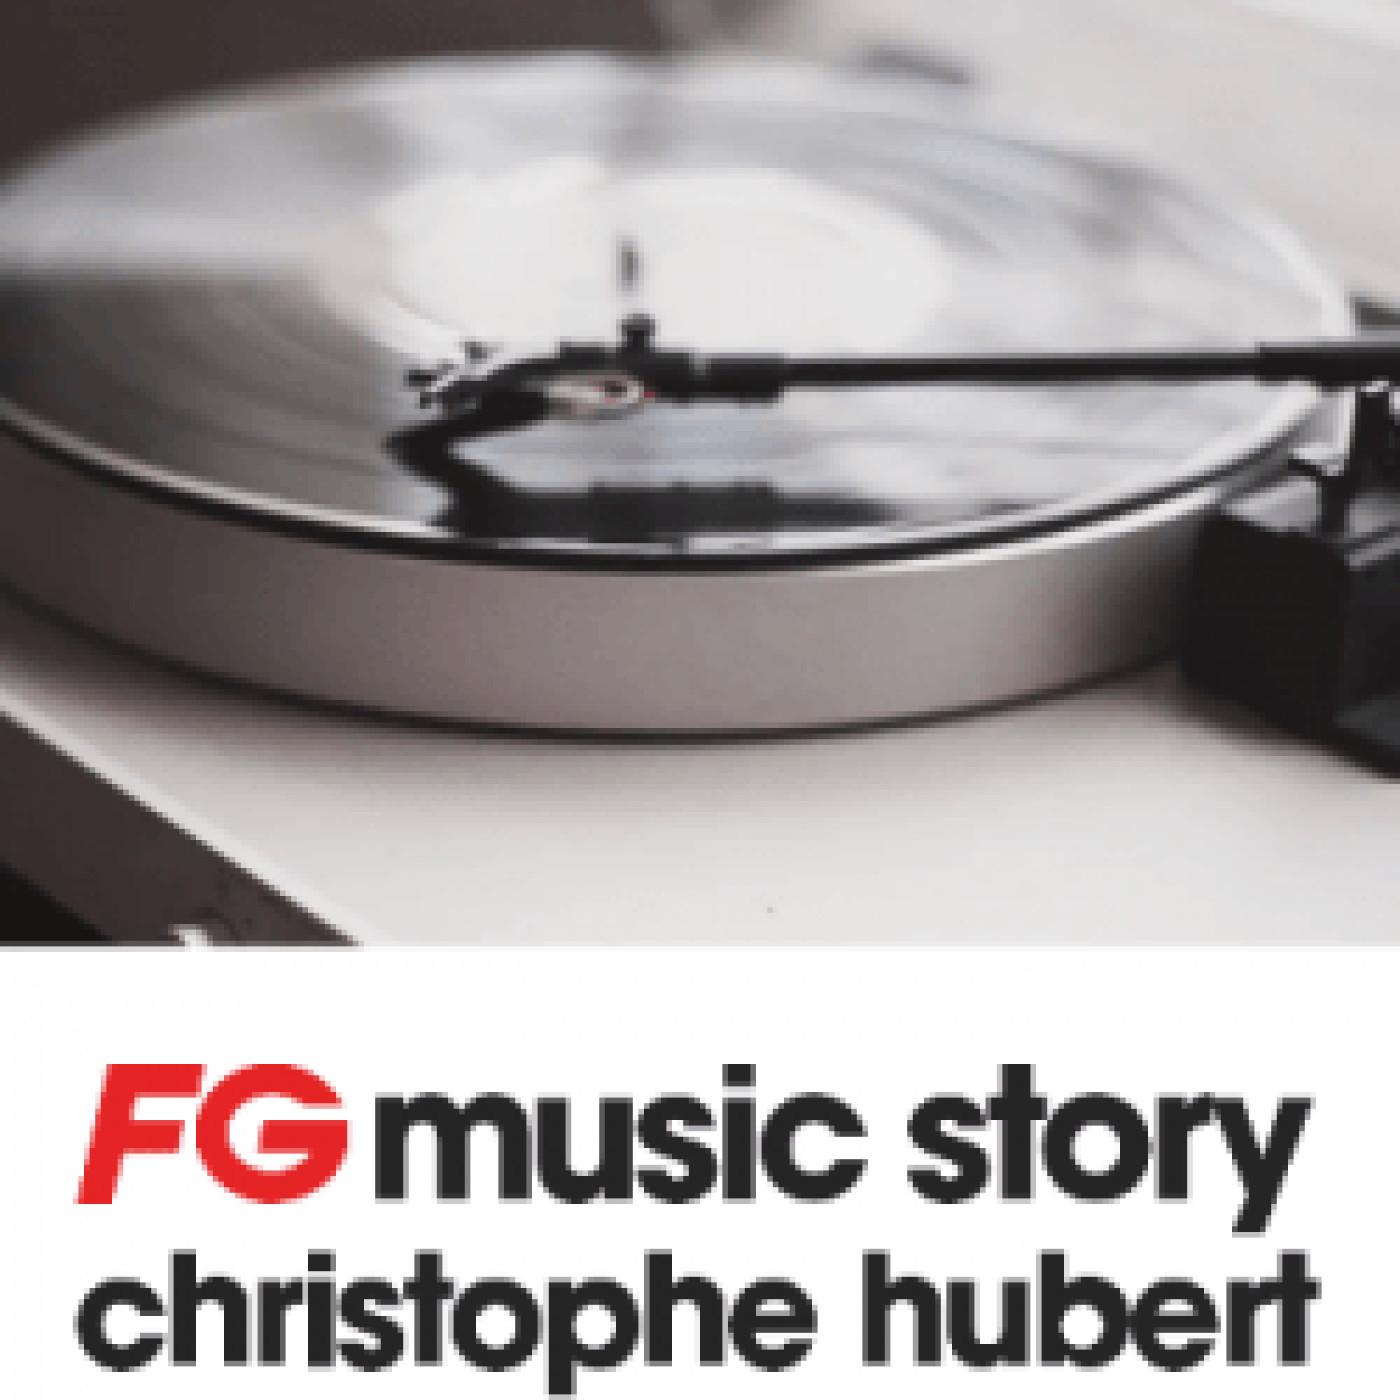 FG MUSIC STORY : FEDER